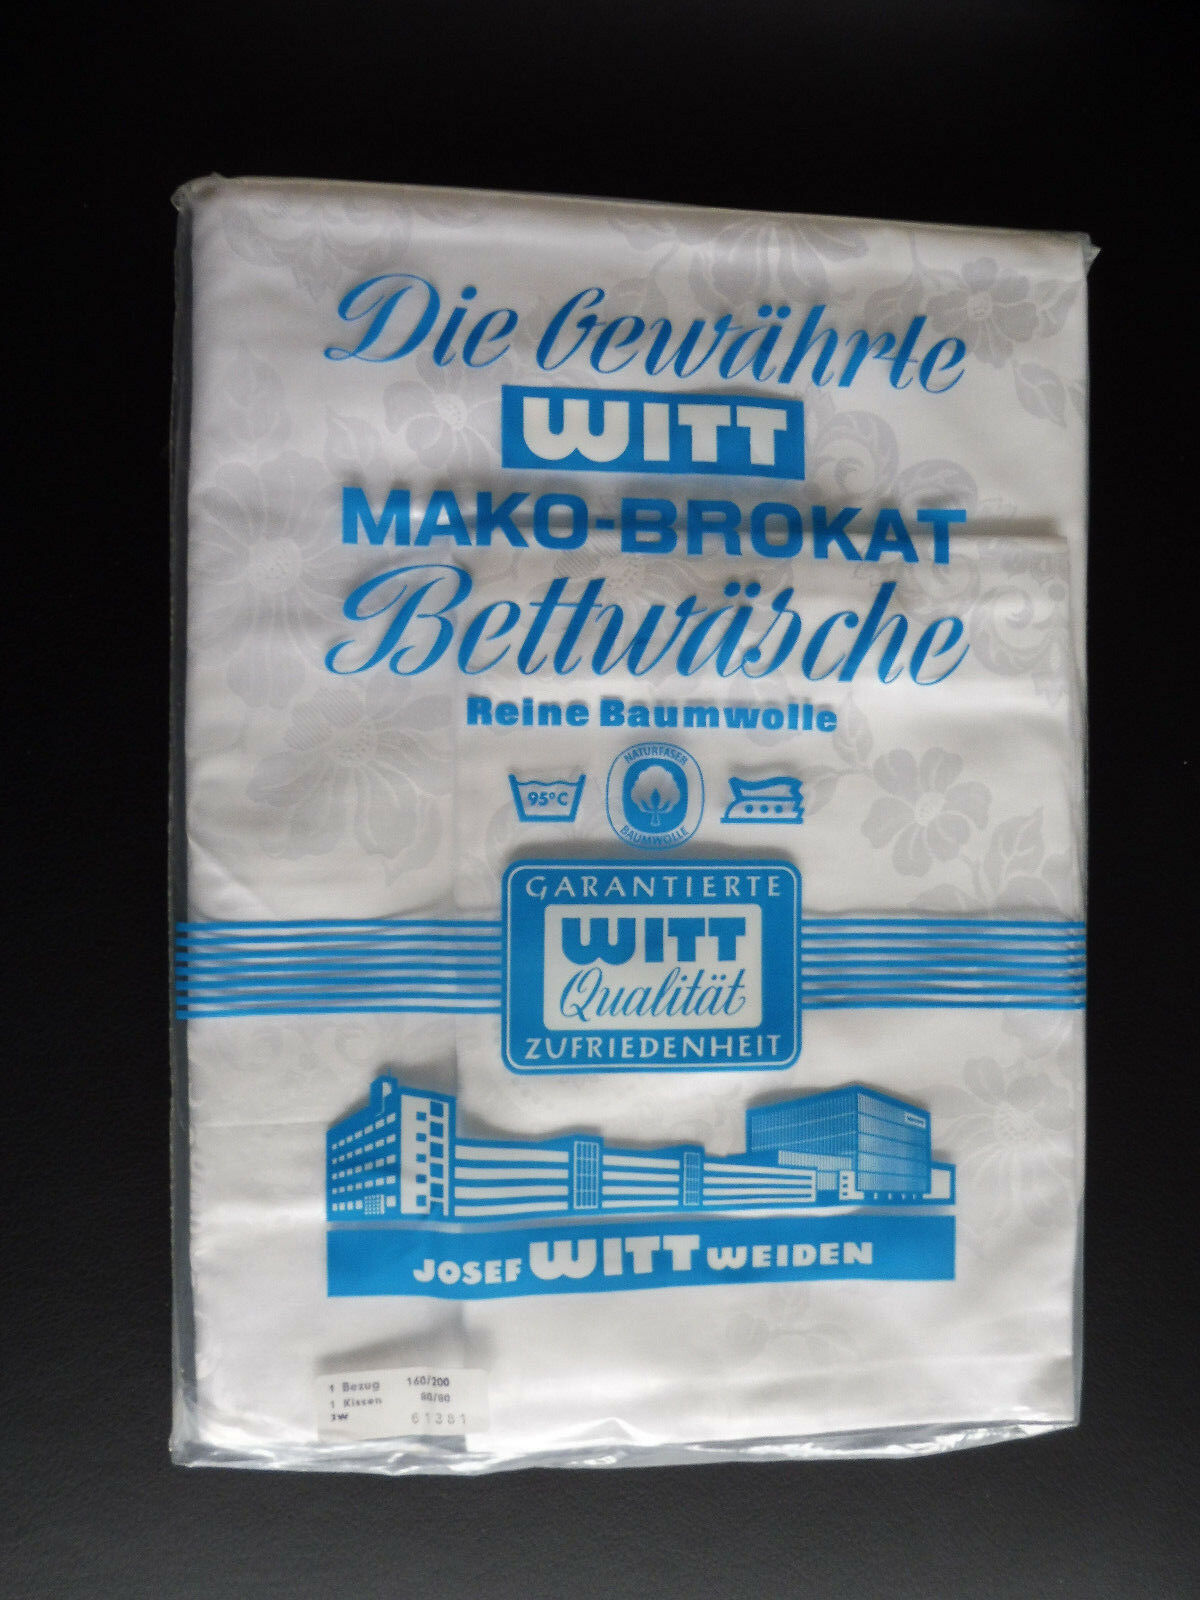 1 Mako-Brokat Bettbezug 160x200, 1 Kissen 80x80, Blaumenmuster, 70er Jahre